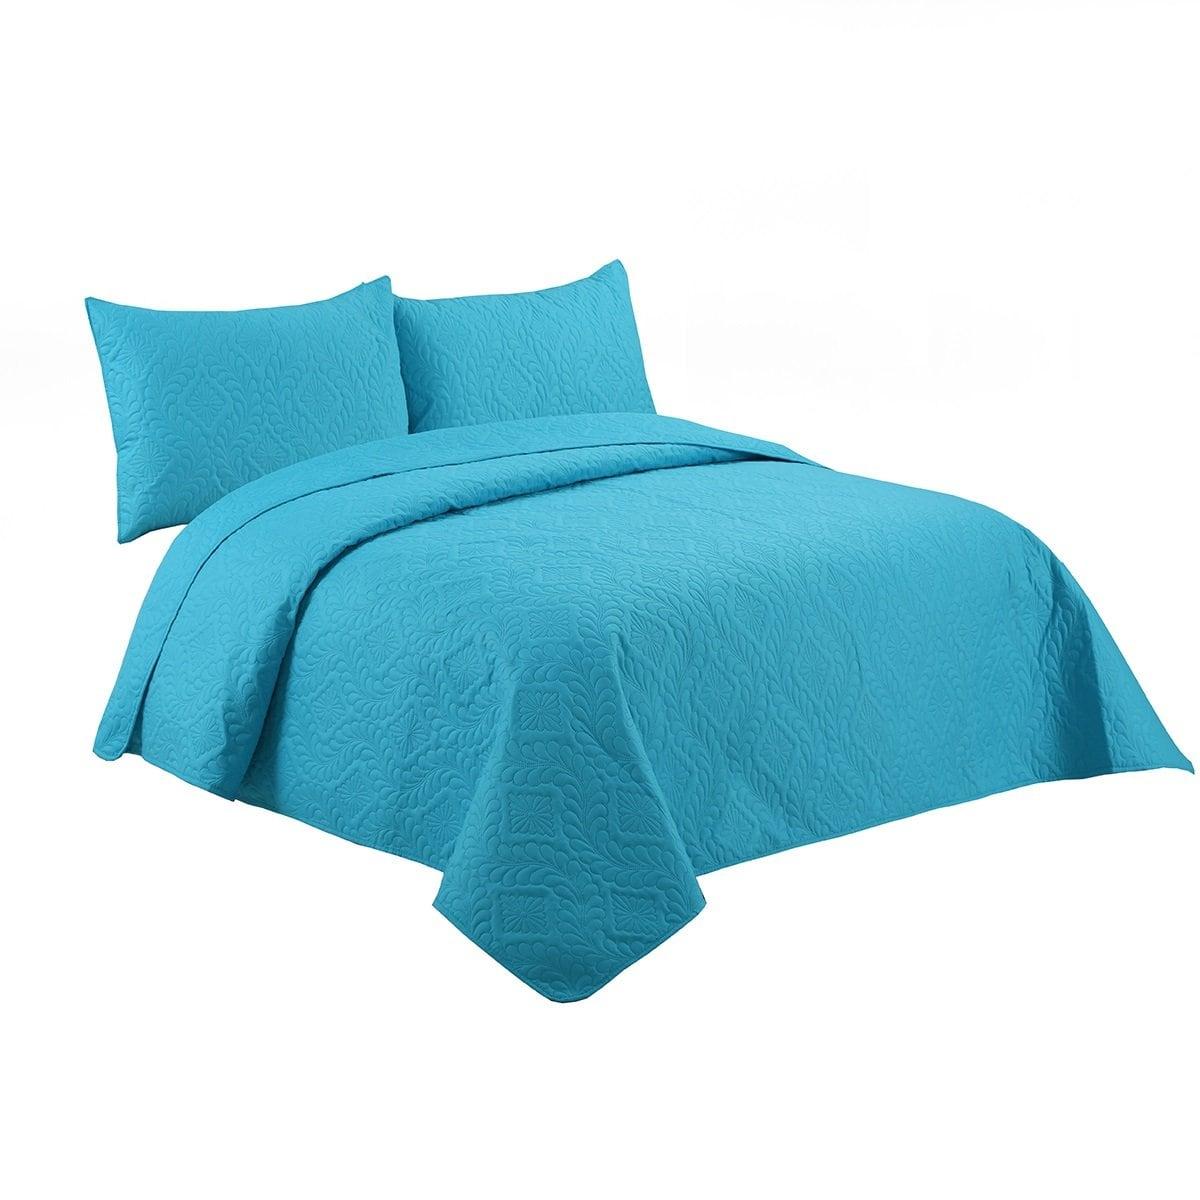 Edrecolcha Garlan Azul Home Nature - King Size